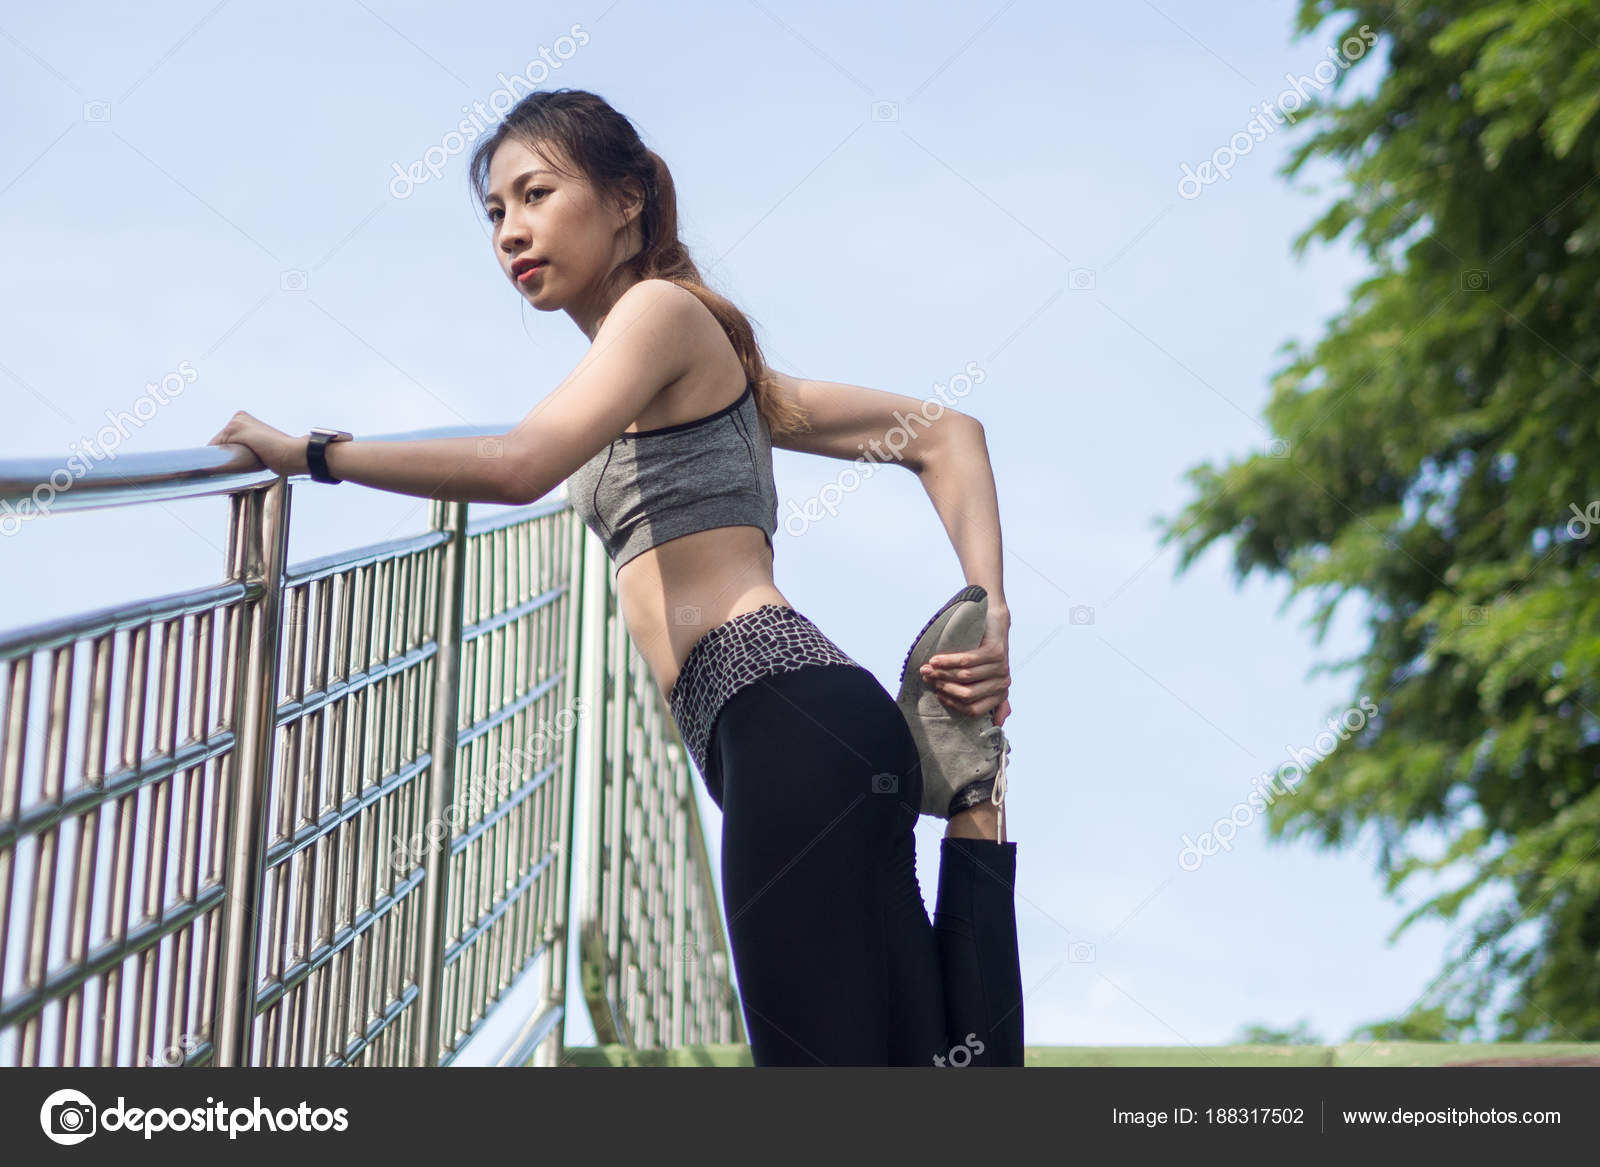 Asian lesbians exercising